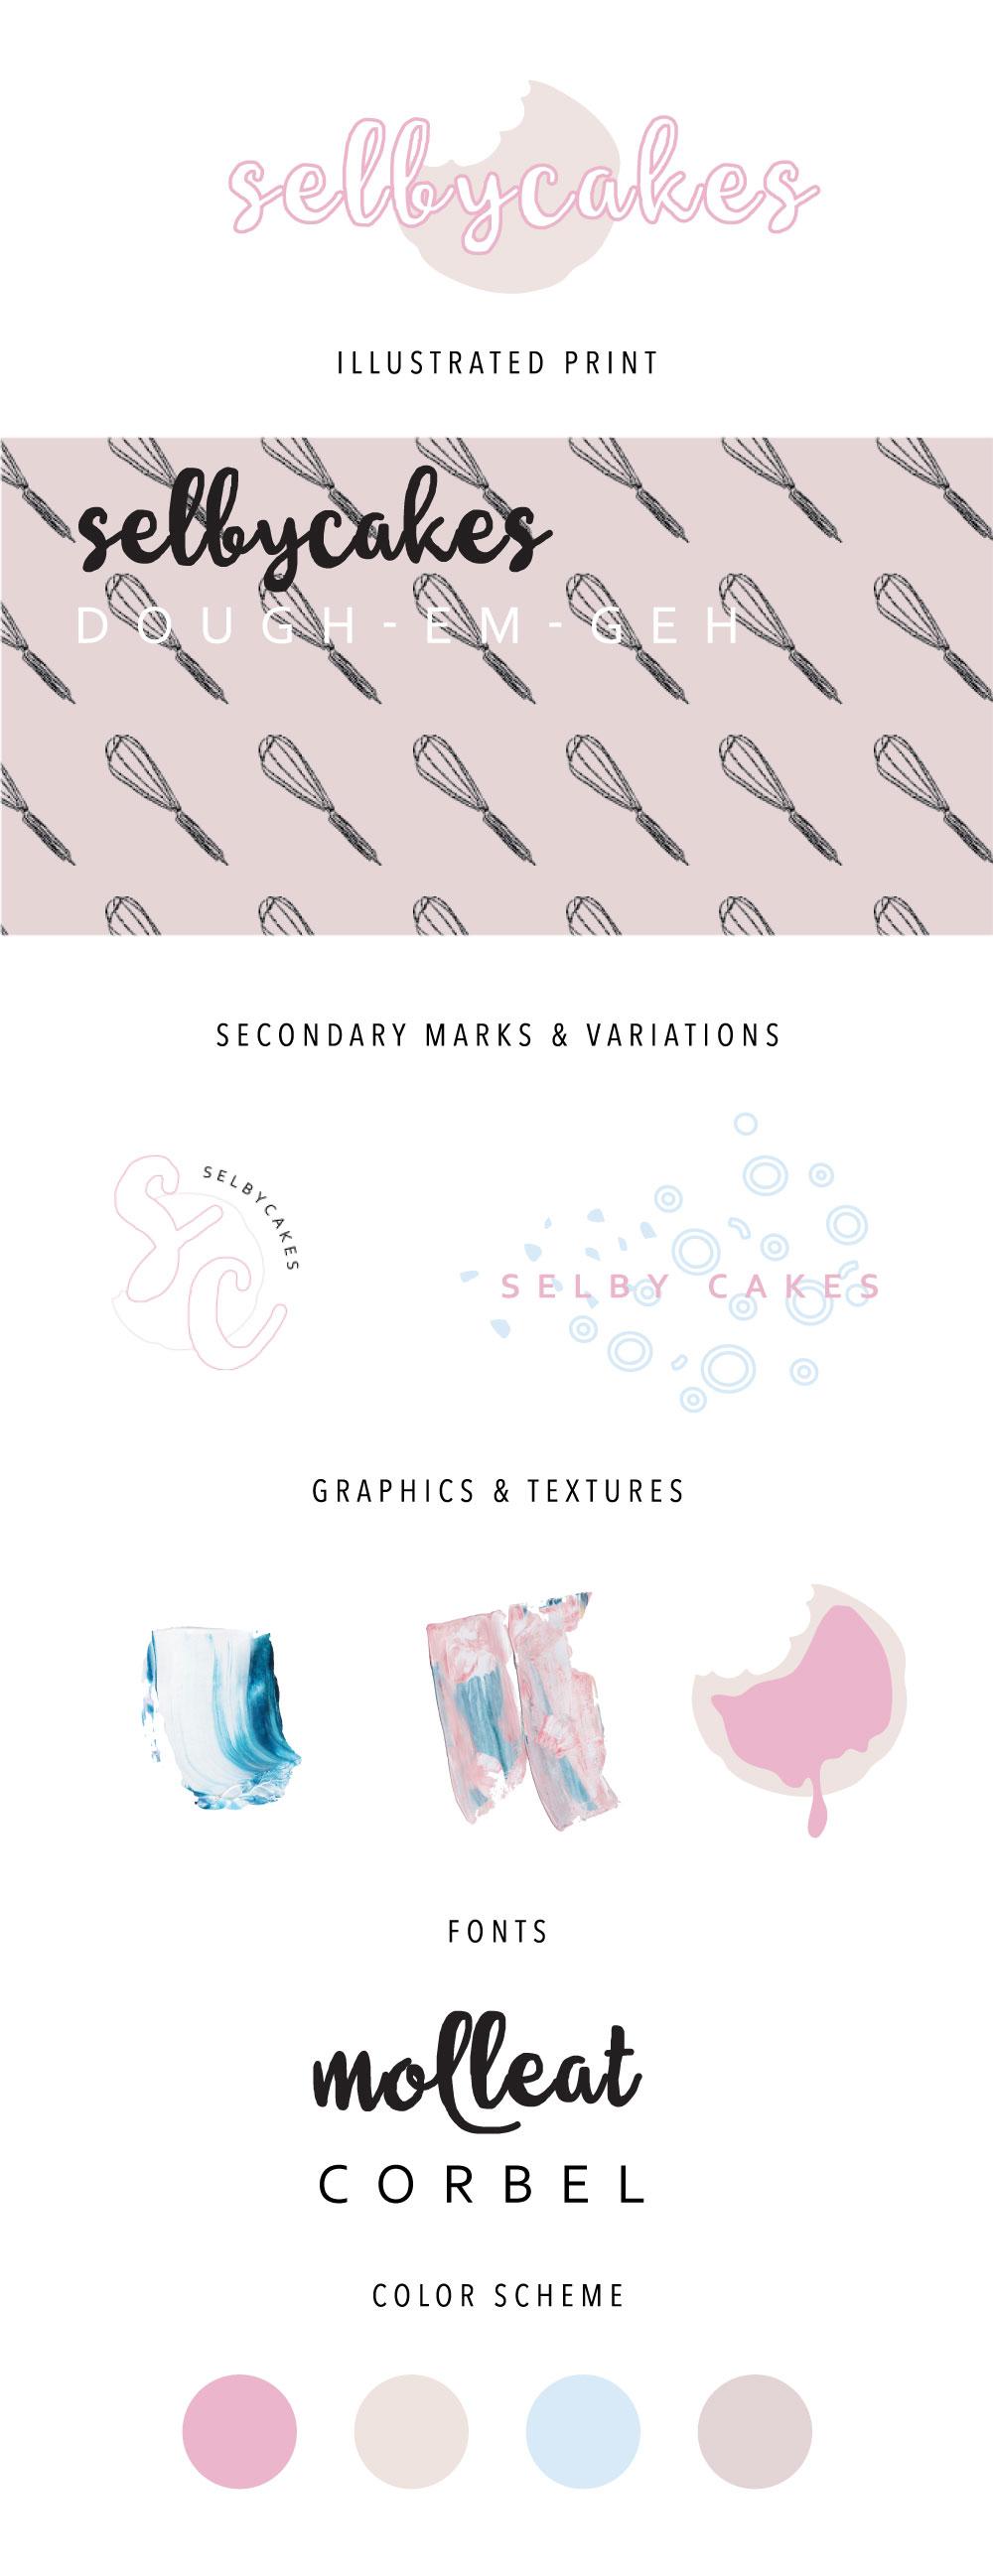 selbycakes-final-brandingboard.jpg